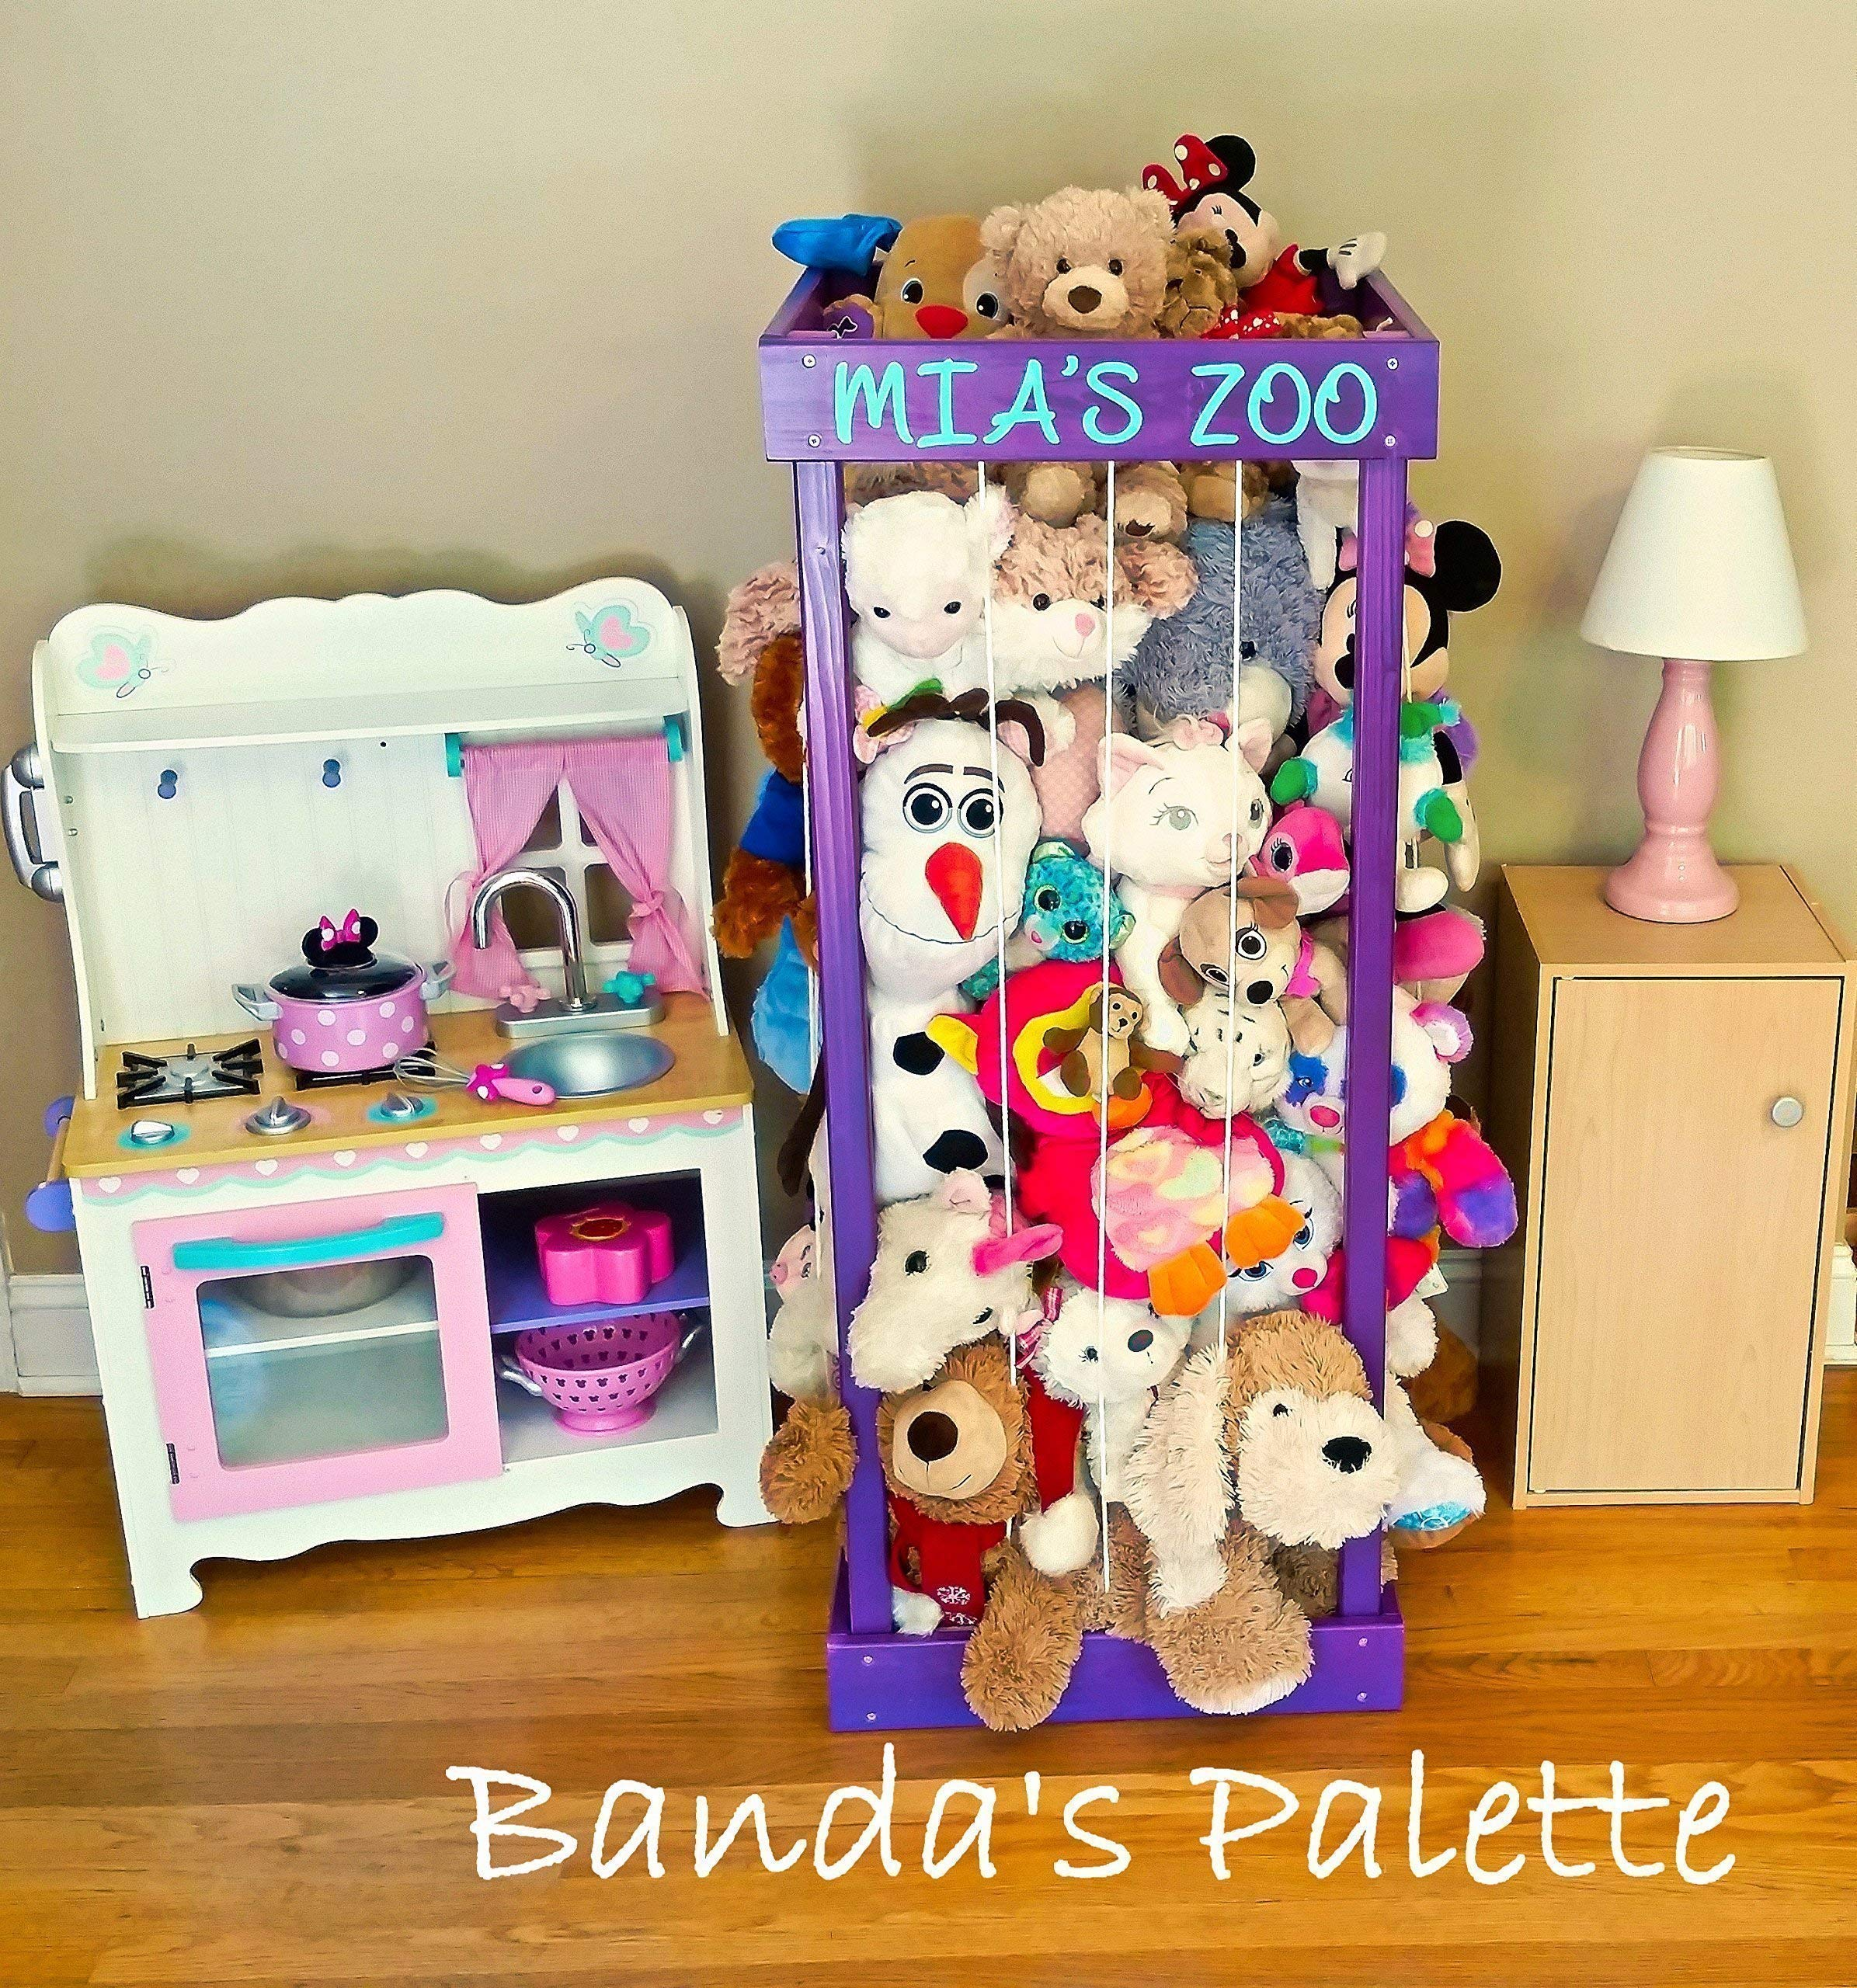 2', 32'', 3', 4' Personalized Stuffed Animal Zoo, Wood Animal Holder, Storage, Stuffed Animal Organizer, Kids Gifts, Ball Storage, Birthday Gift, Stuffed Animal Storage, Zoo Keeper by Banda's Palette